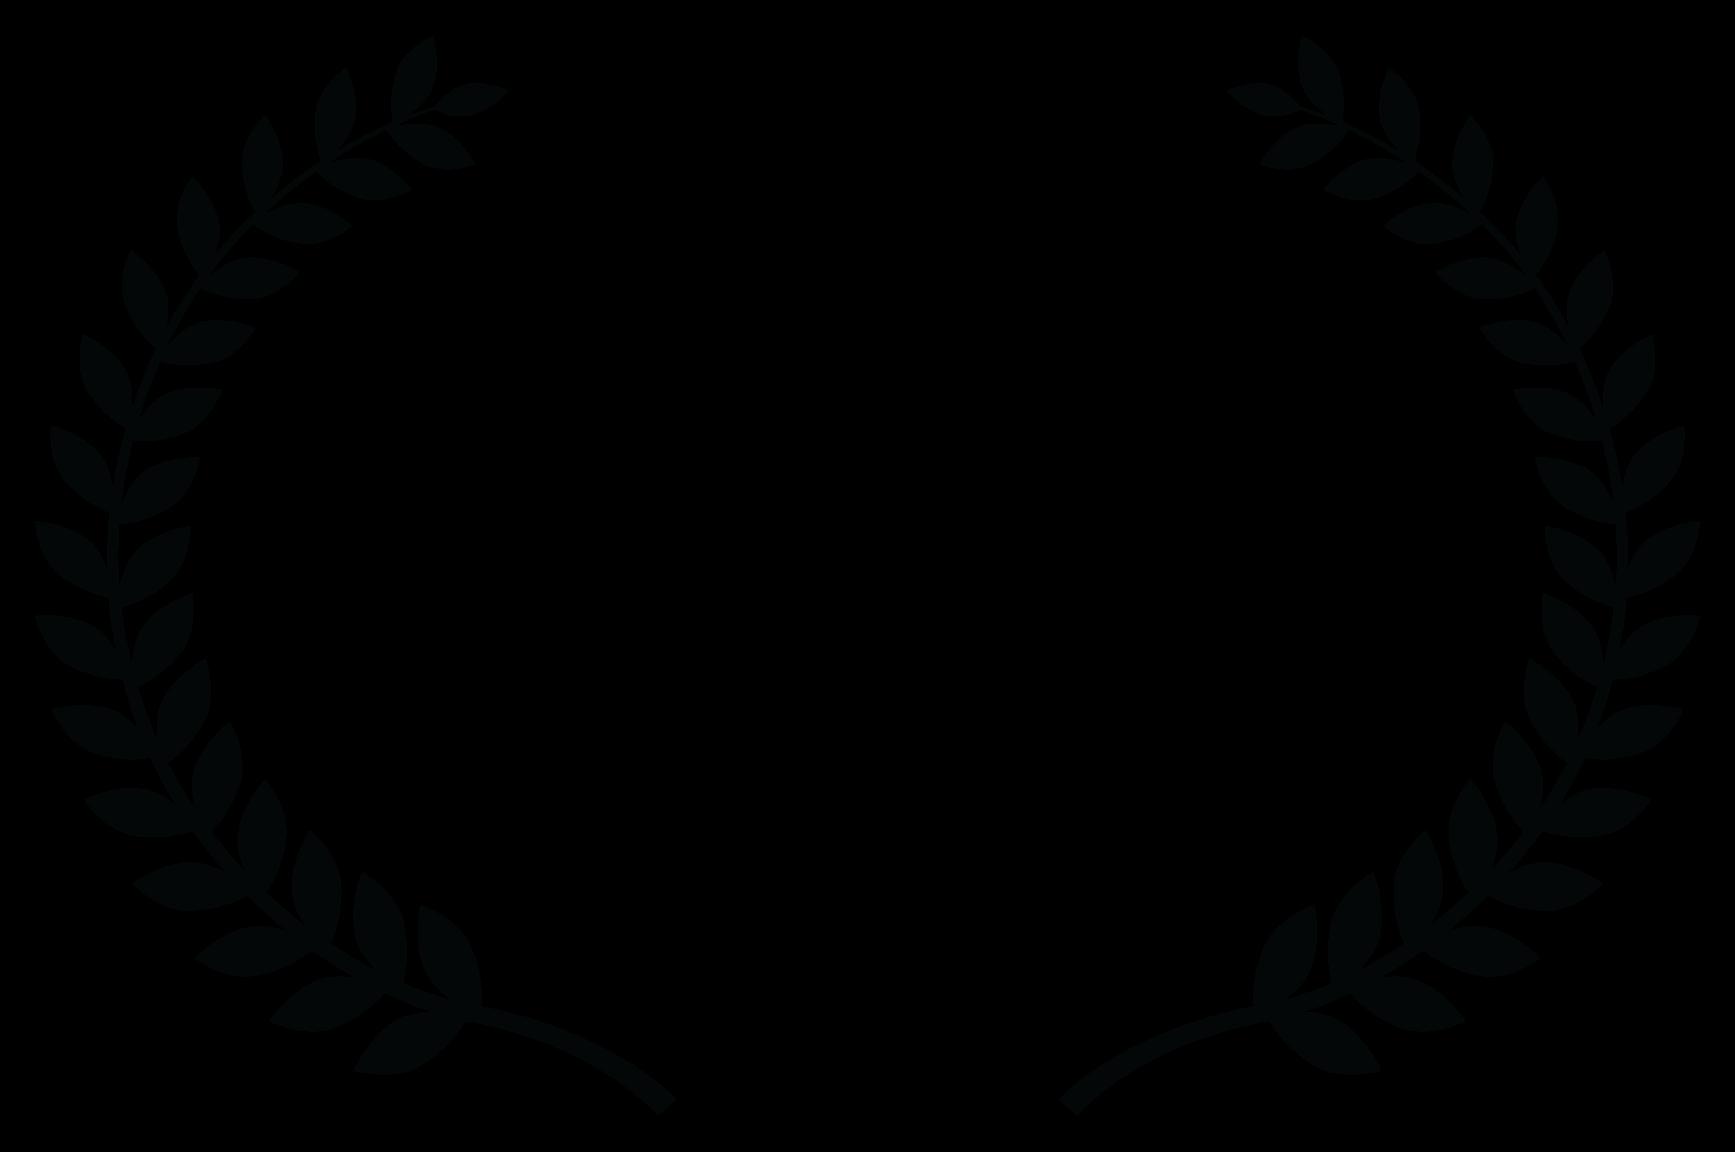 OFFICIAL SELECTION - World Cine Fest - 2021 (1)